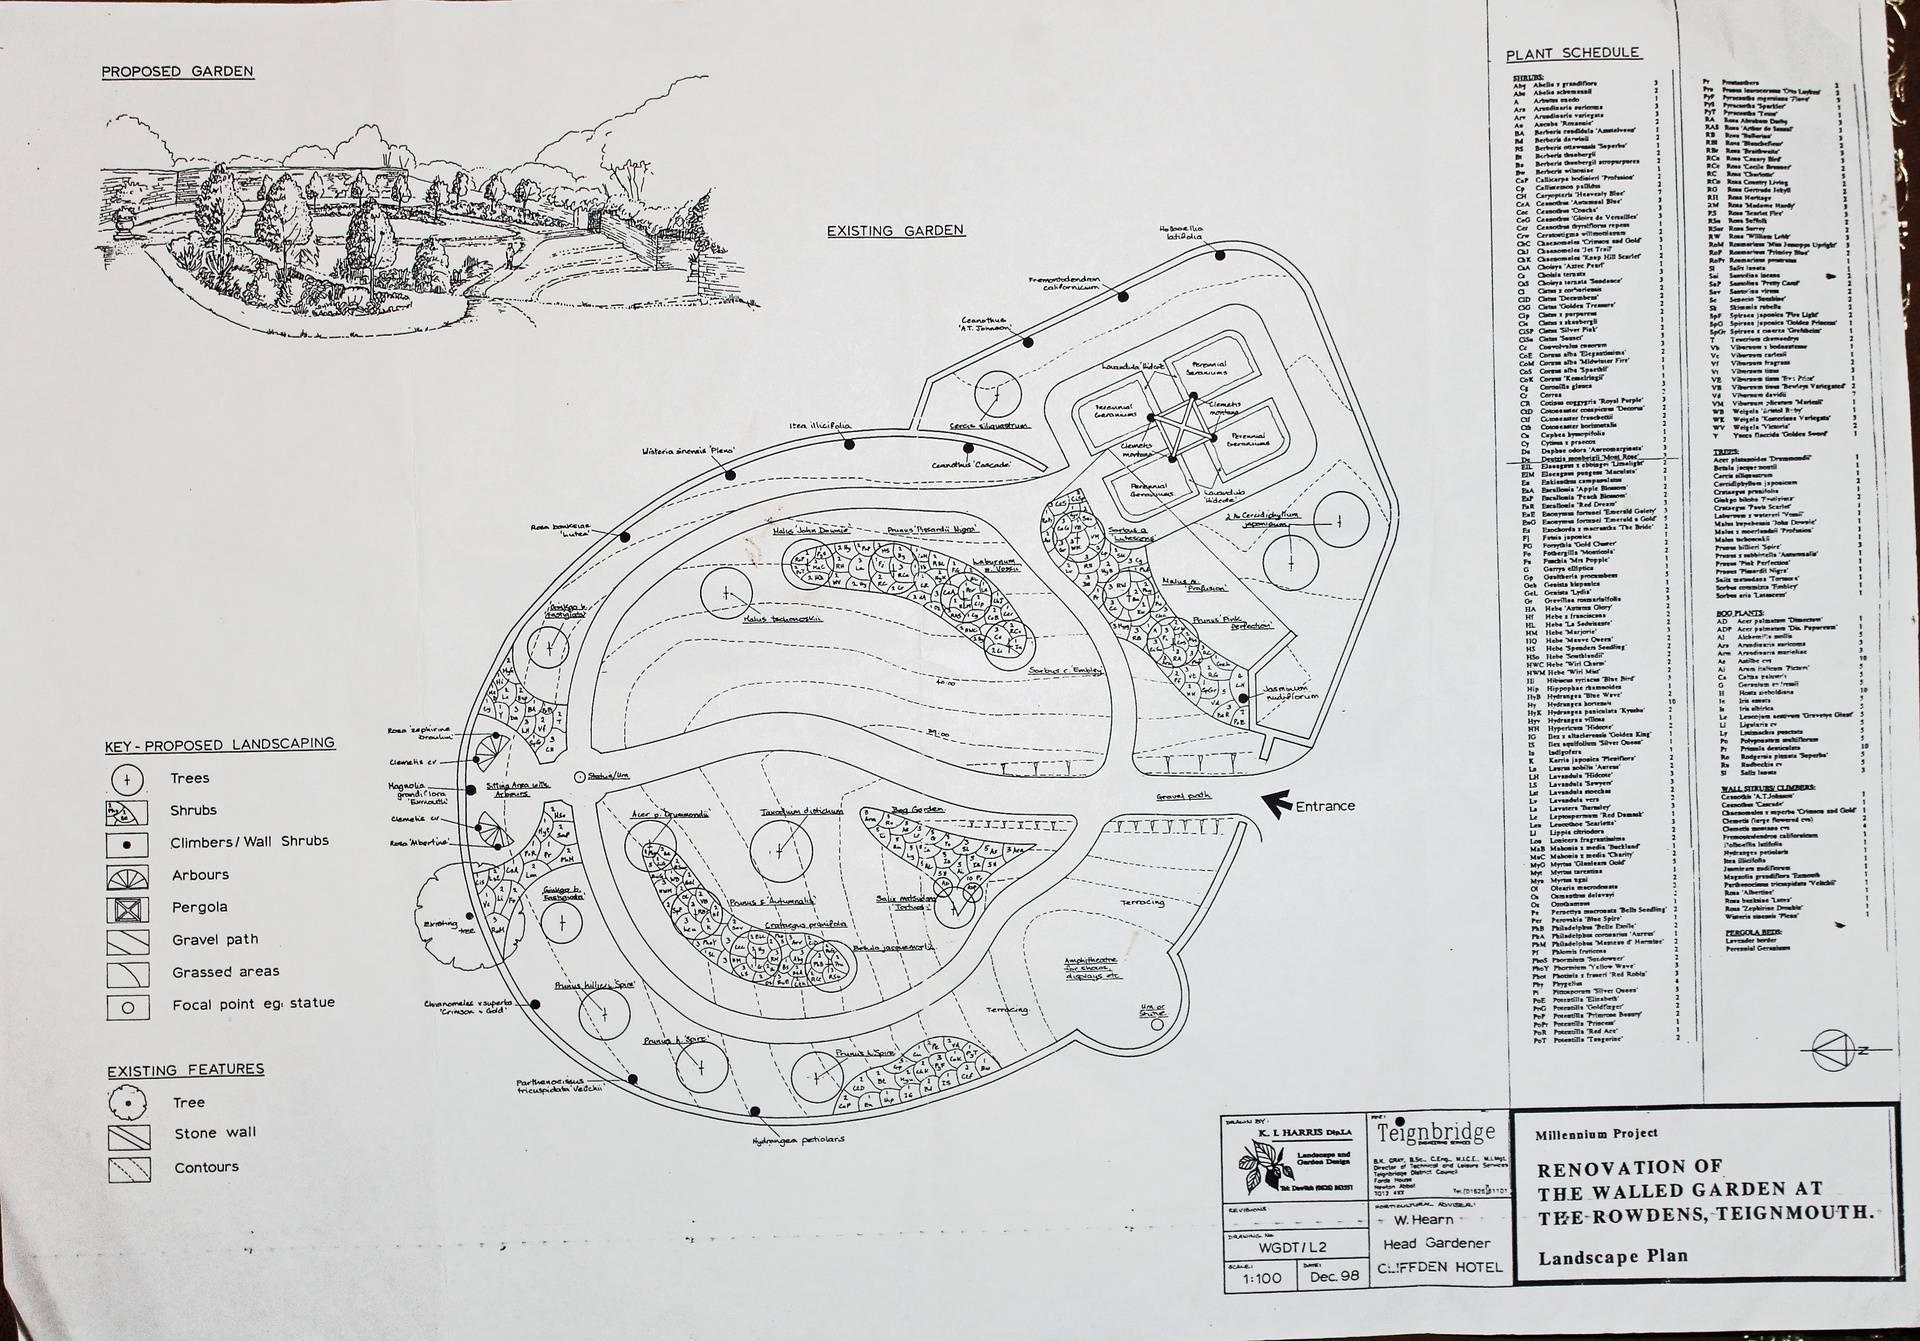 Landscape Plan for Walled Garden, December 1998